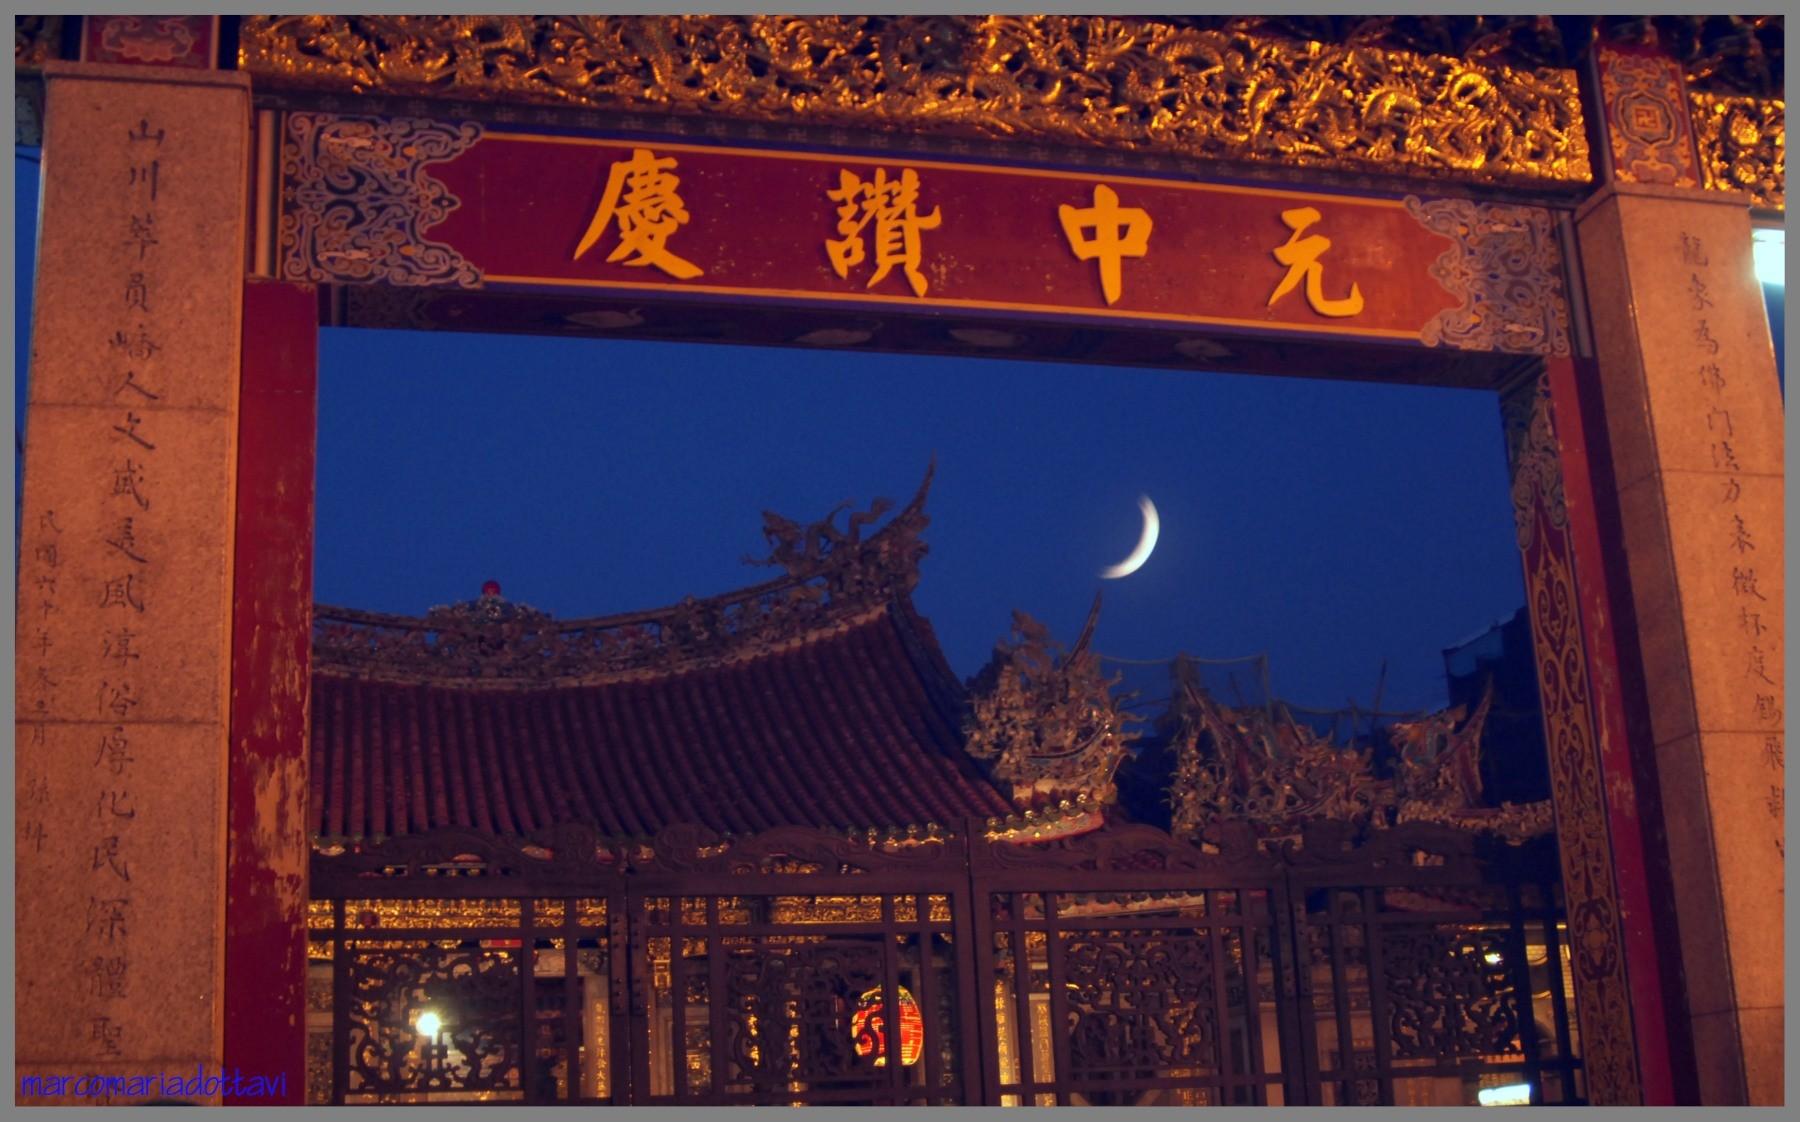 5012808-Taipei-Karaoke-0016 Storie di Luce